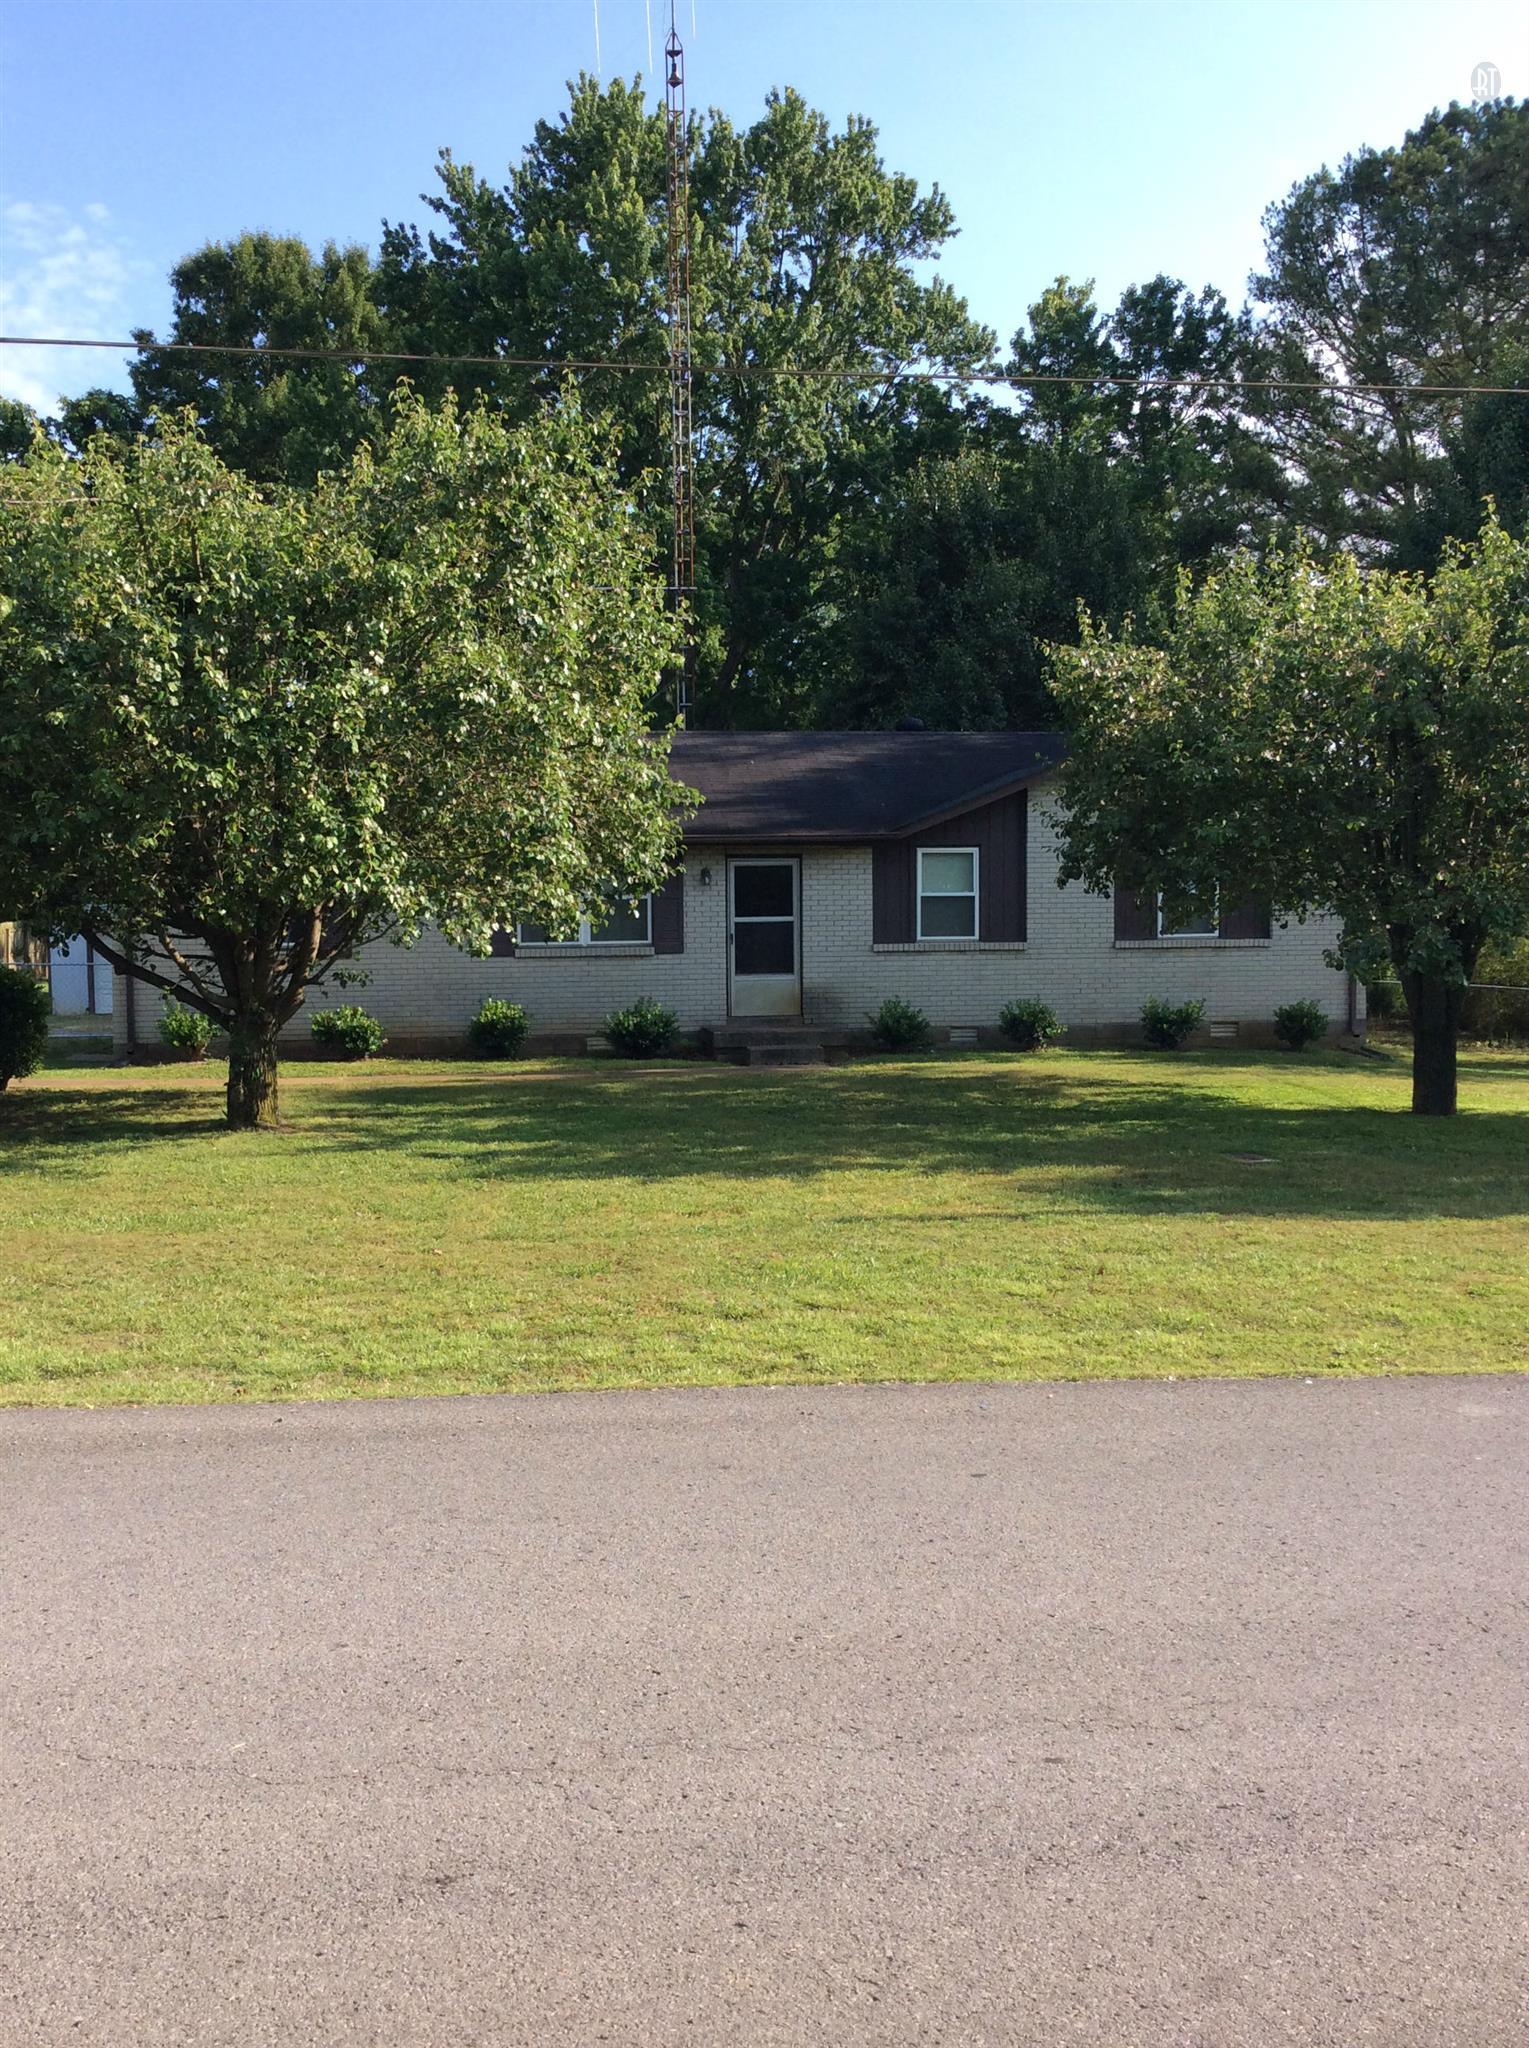 502 Roundup Rd, Smyrna, TN 37167